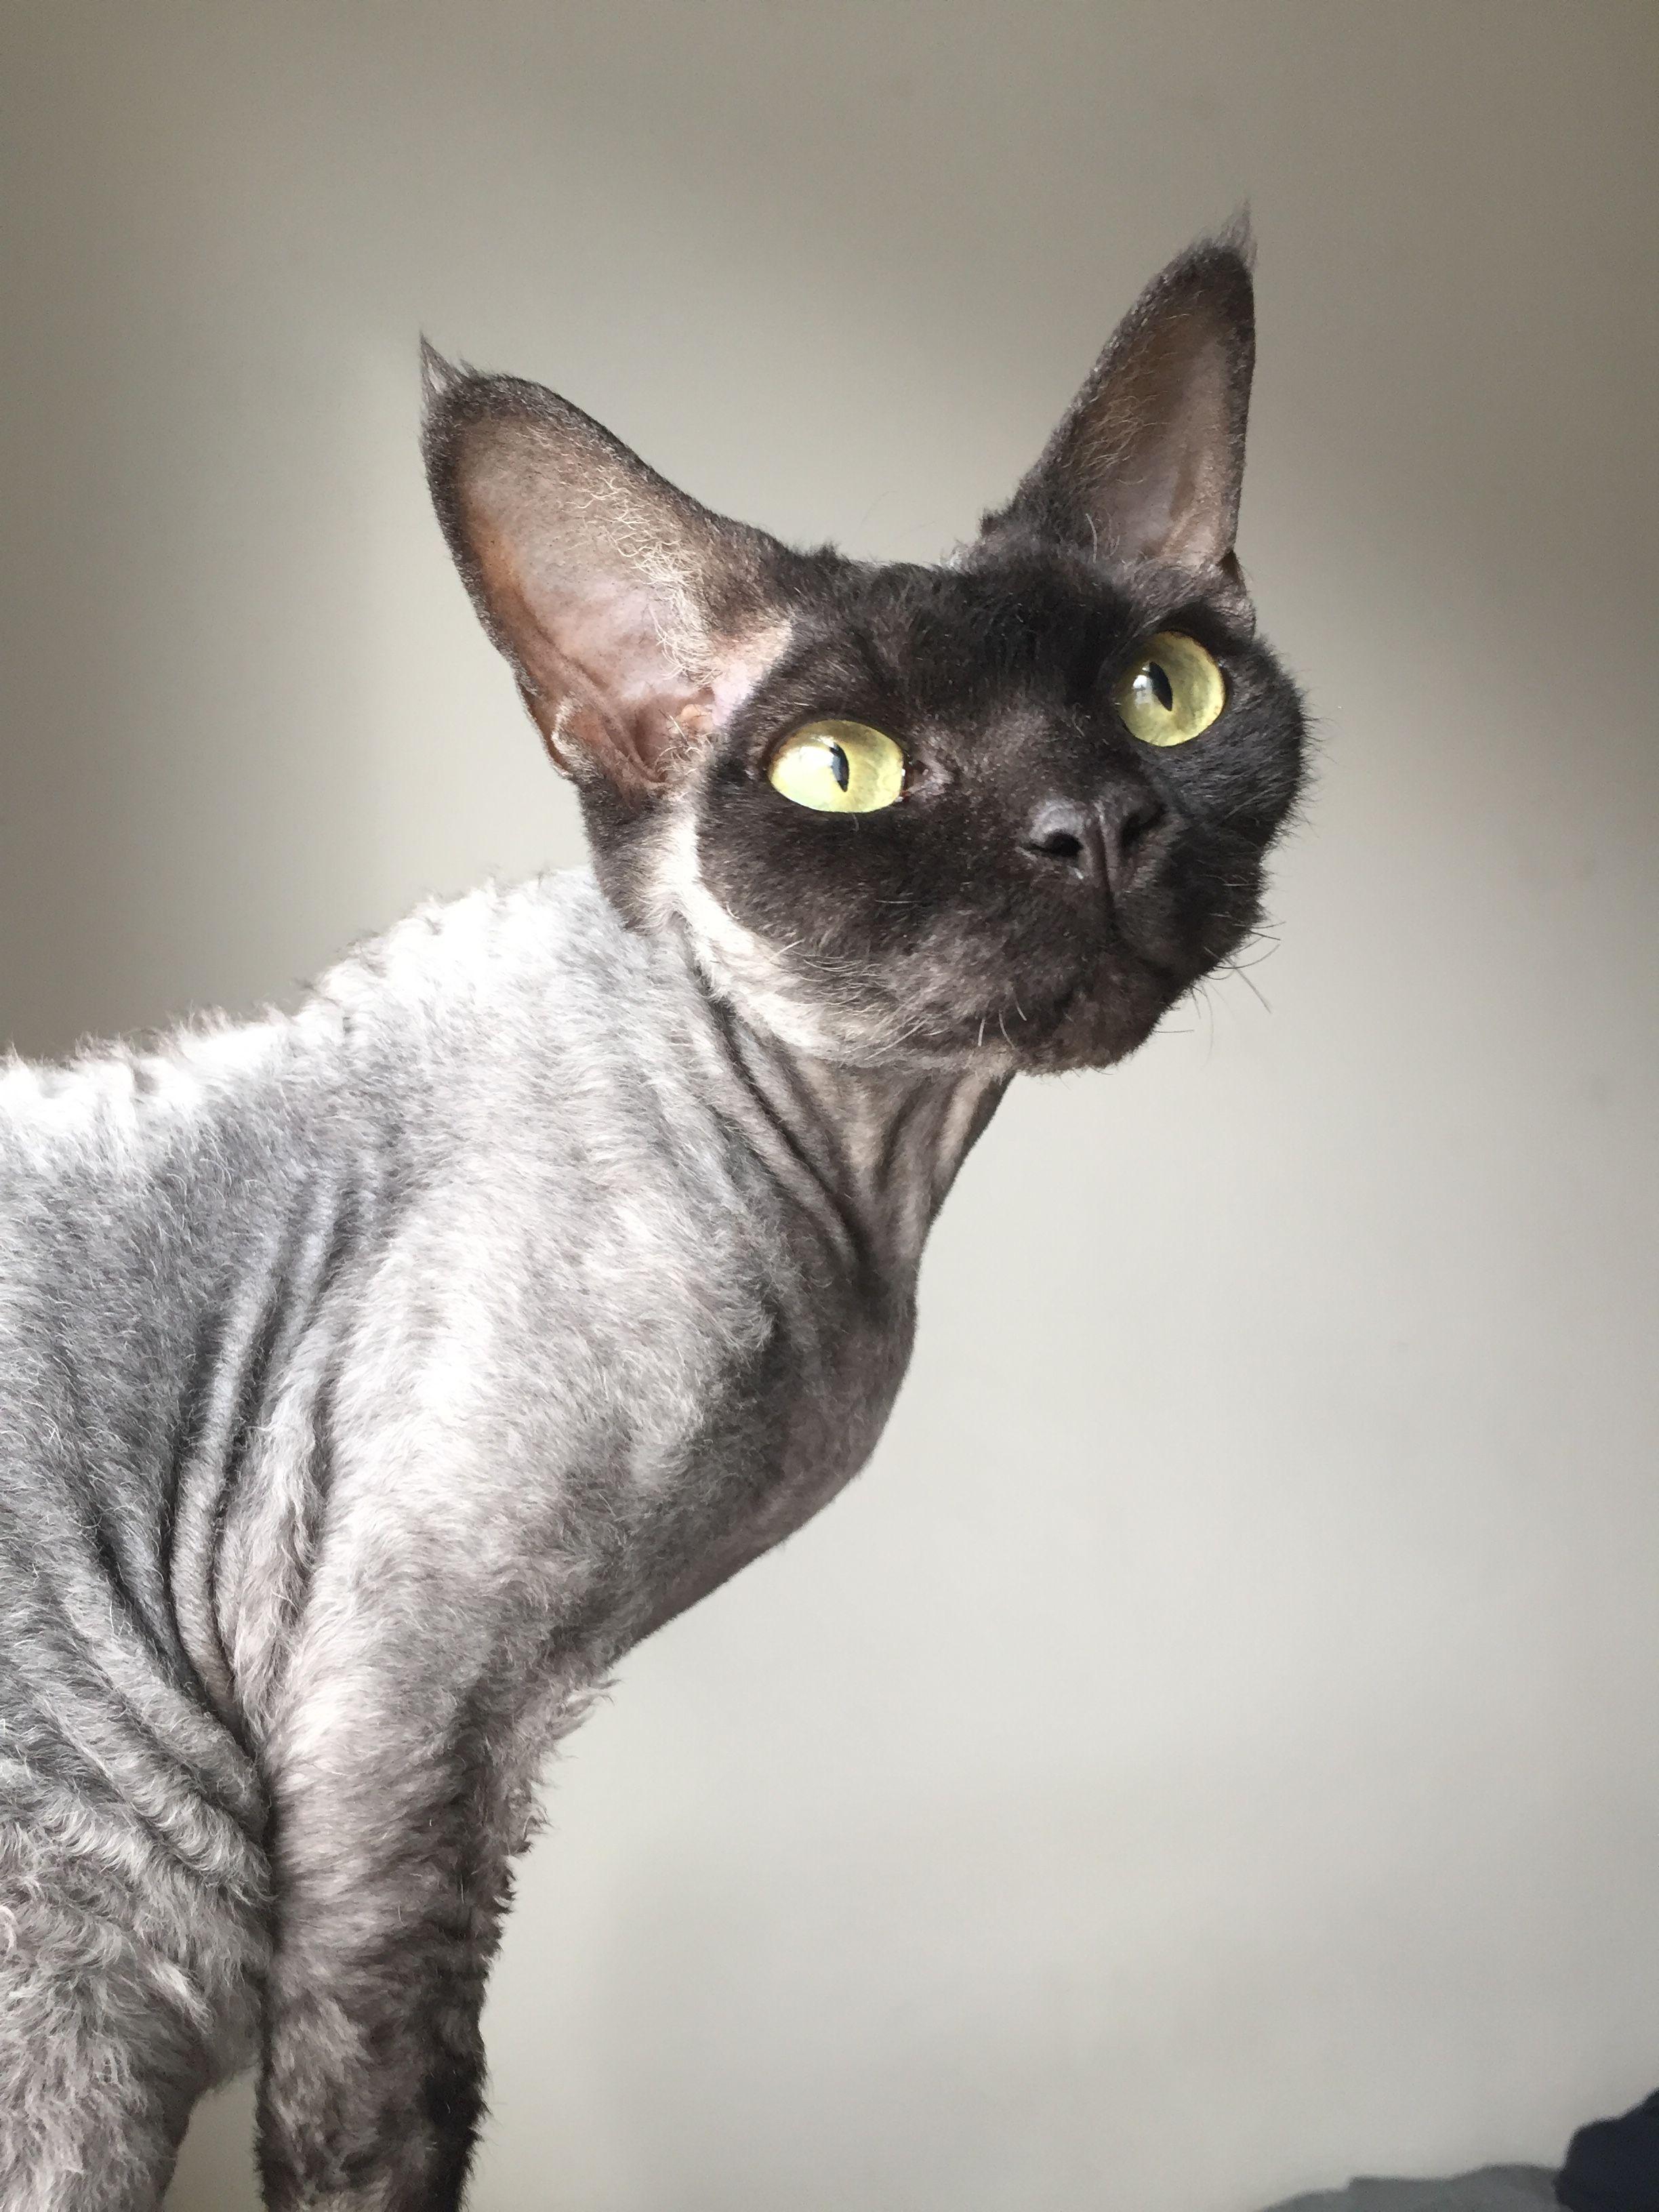 Lila Devon Rex Devon Rex Cats Purebred Cats Cats With Big Eyes